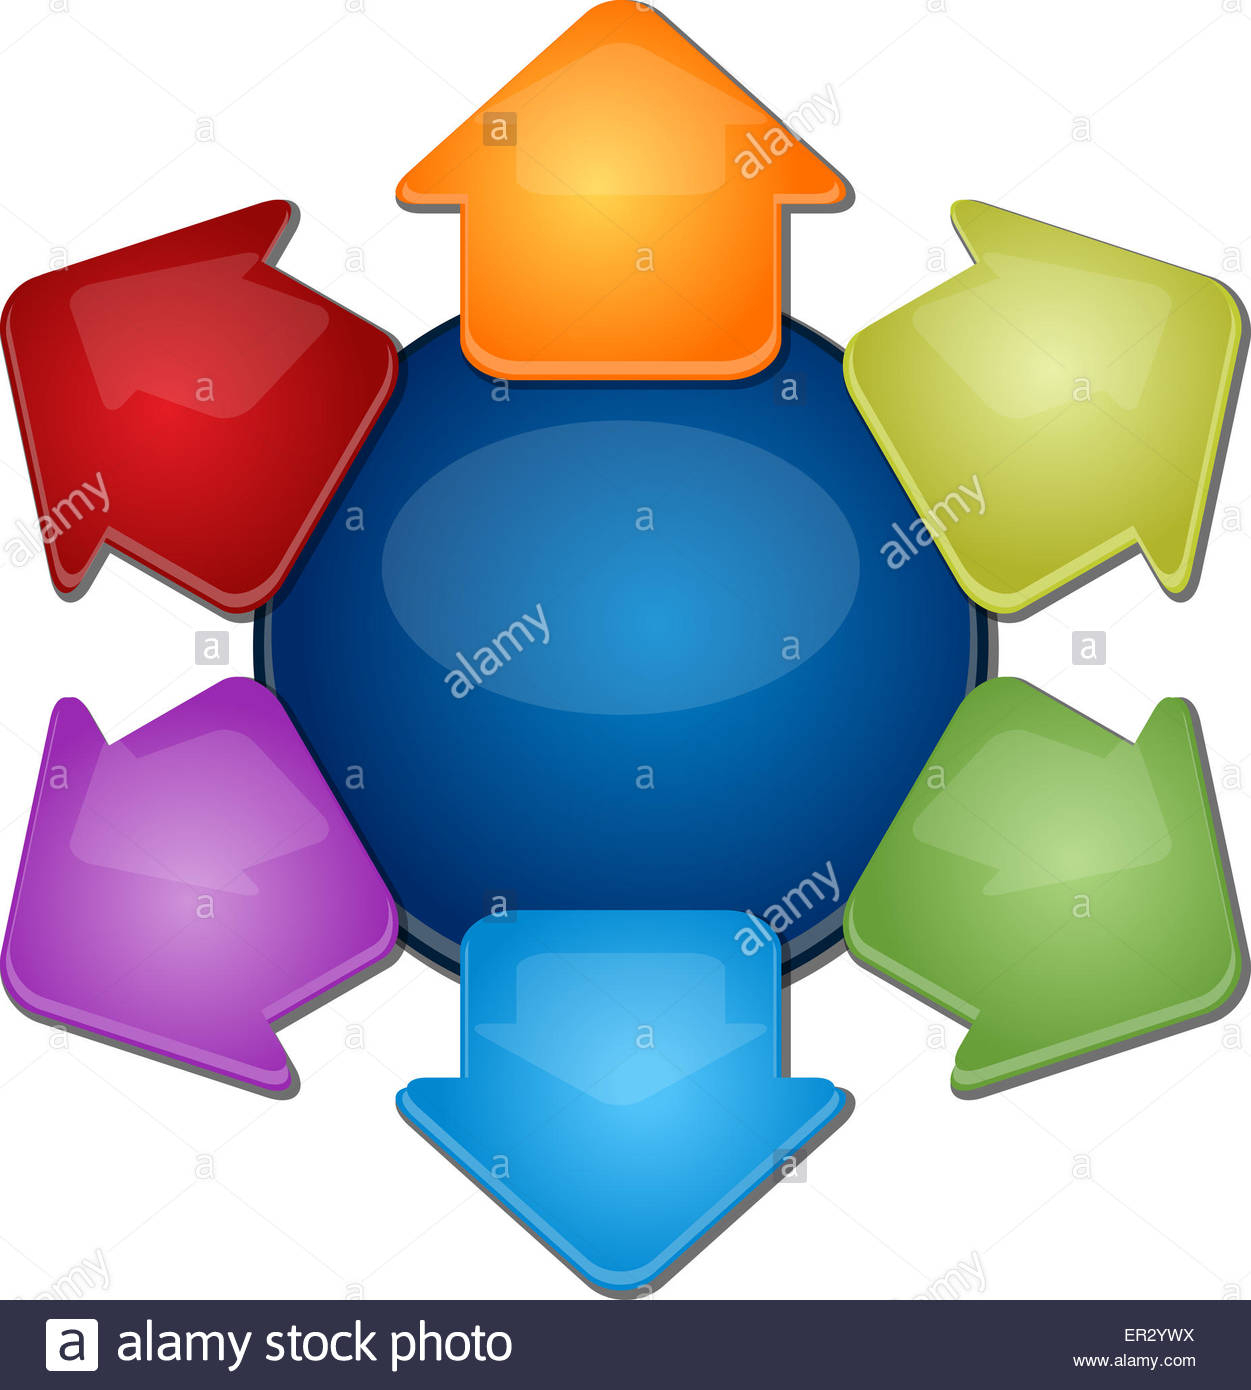 Blank Business Strategy Concept Diagram Illustration Outward regarding Er Diagram Arrow Direction